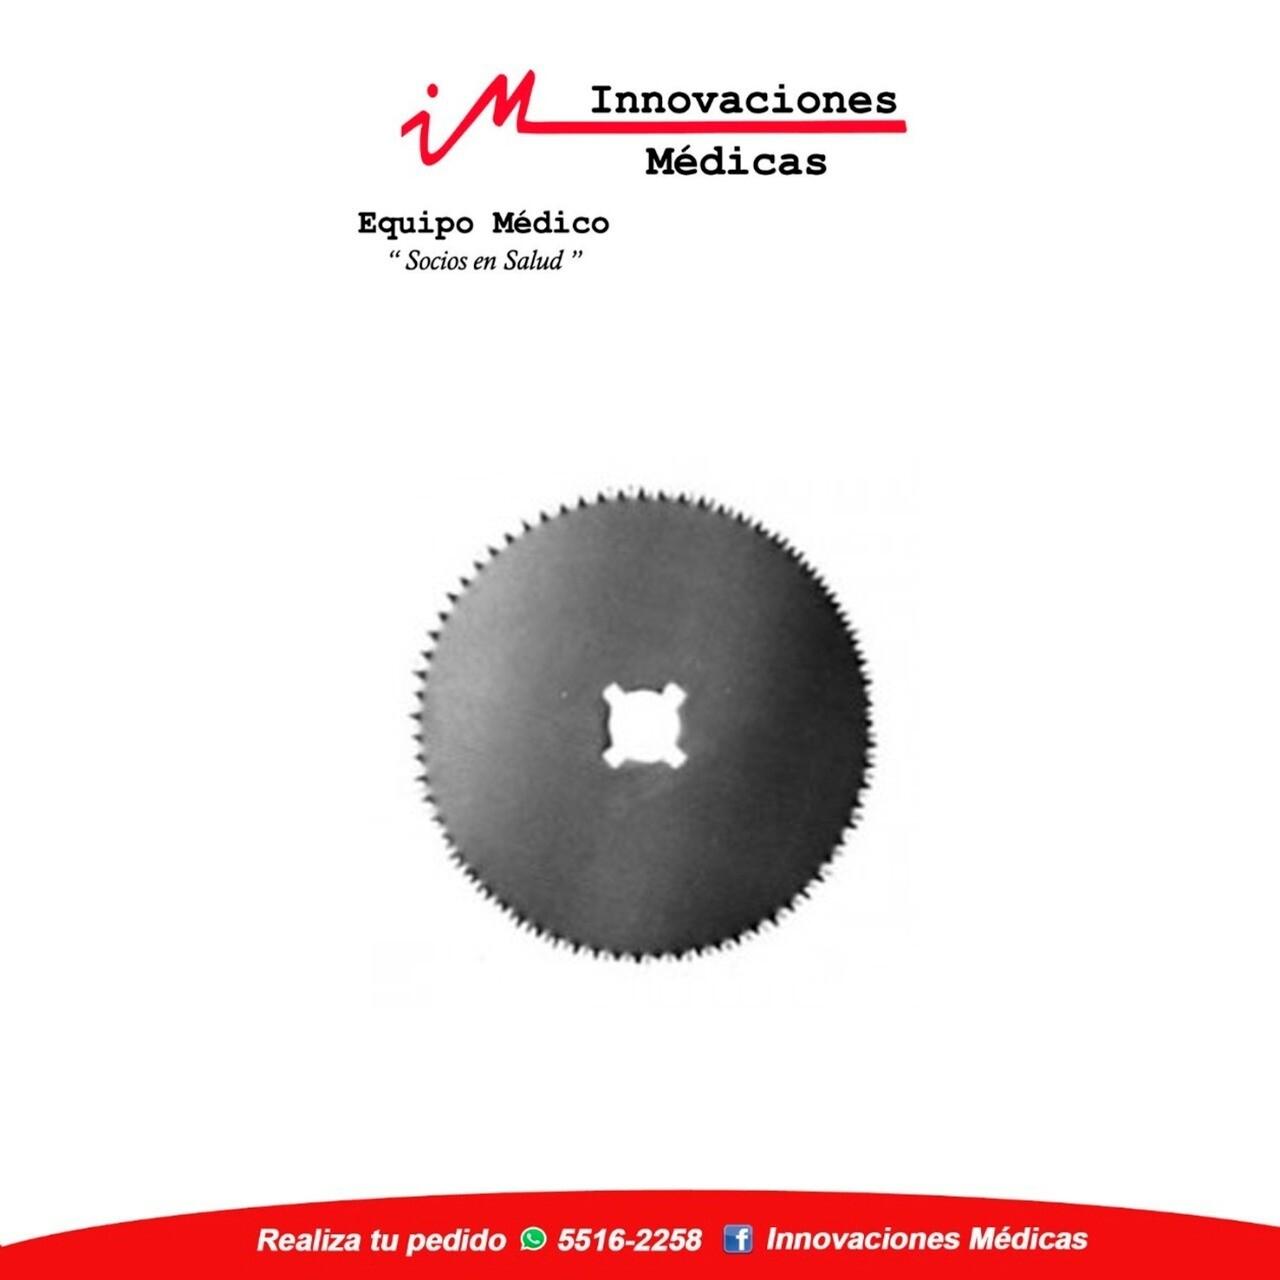 Cuchilla circular para sierra de cortar yeso 50mm